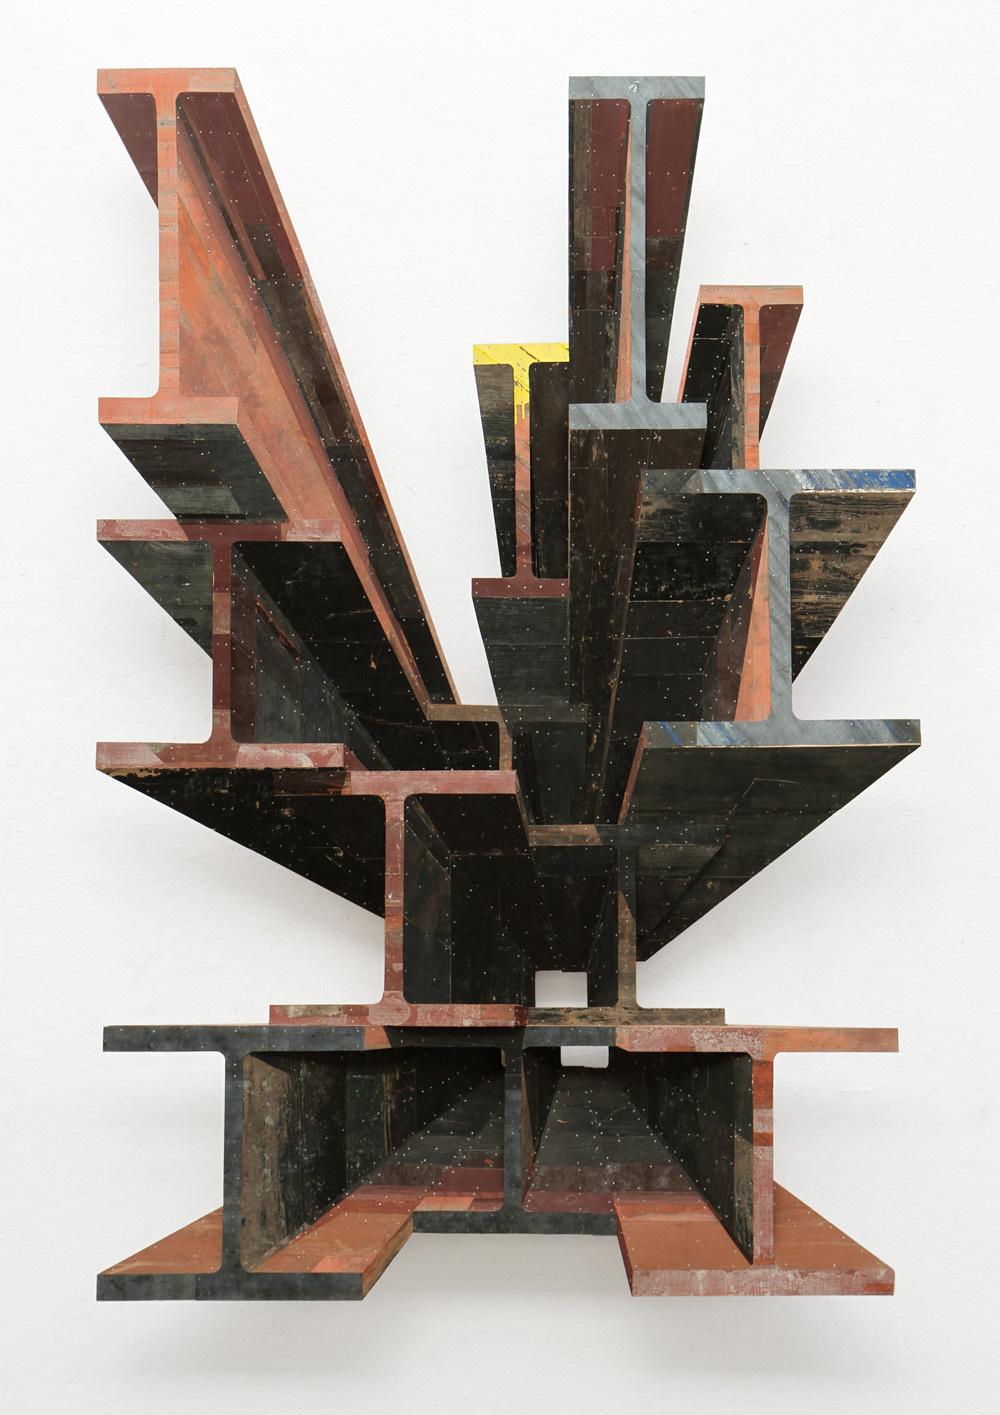 Ron van der Ende-qidye-7